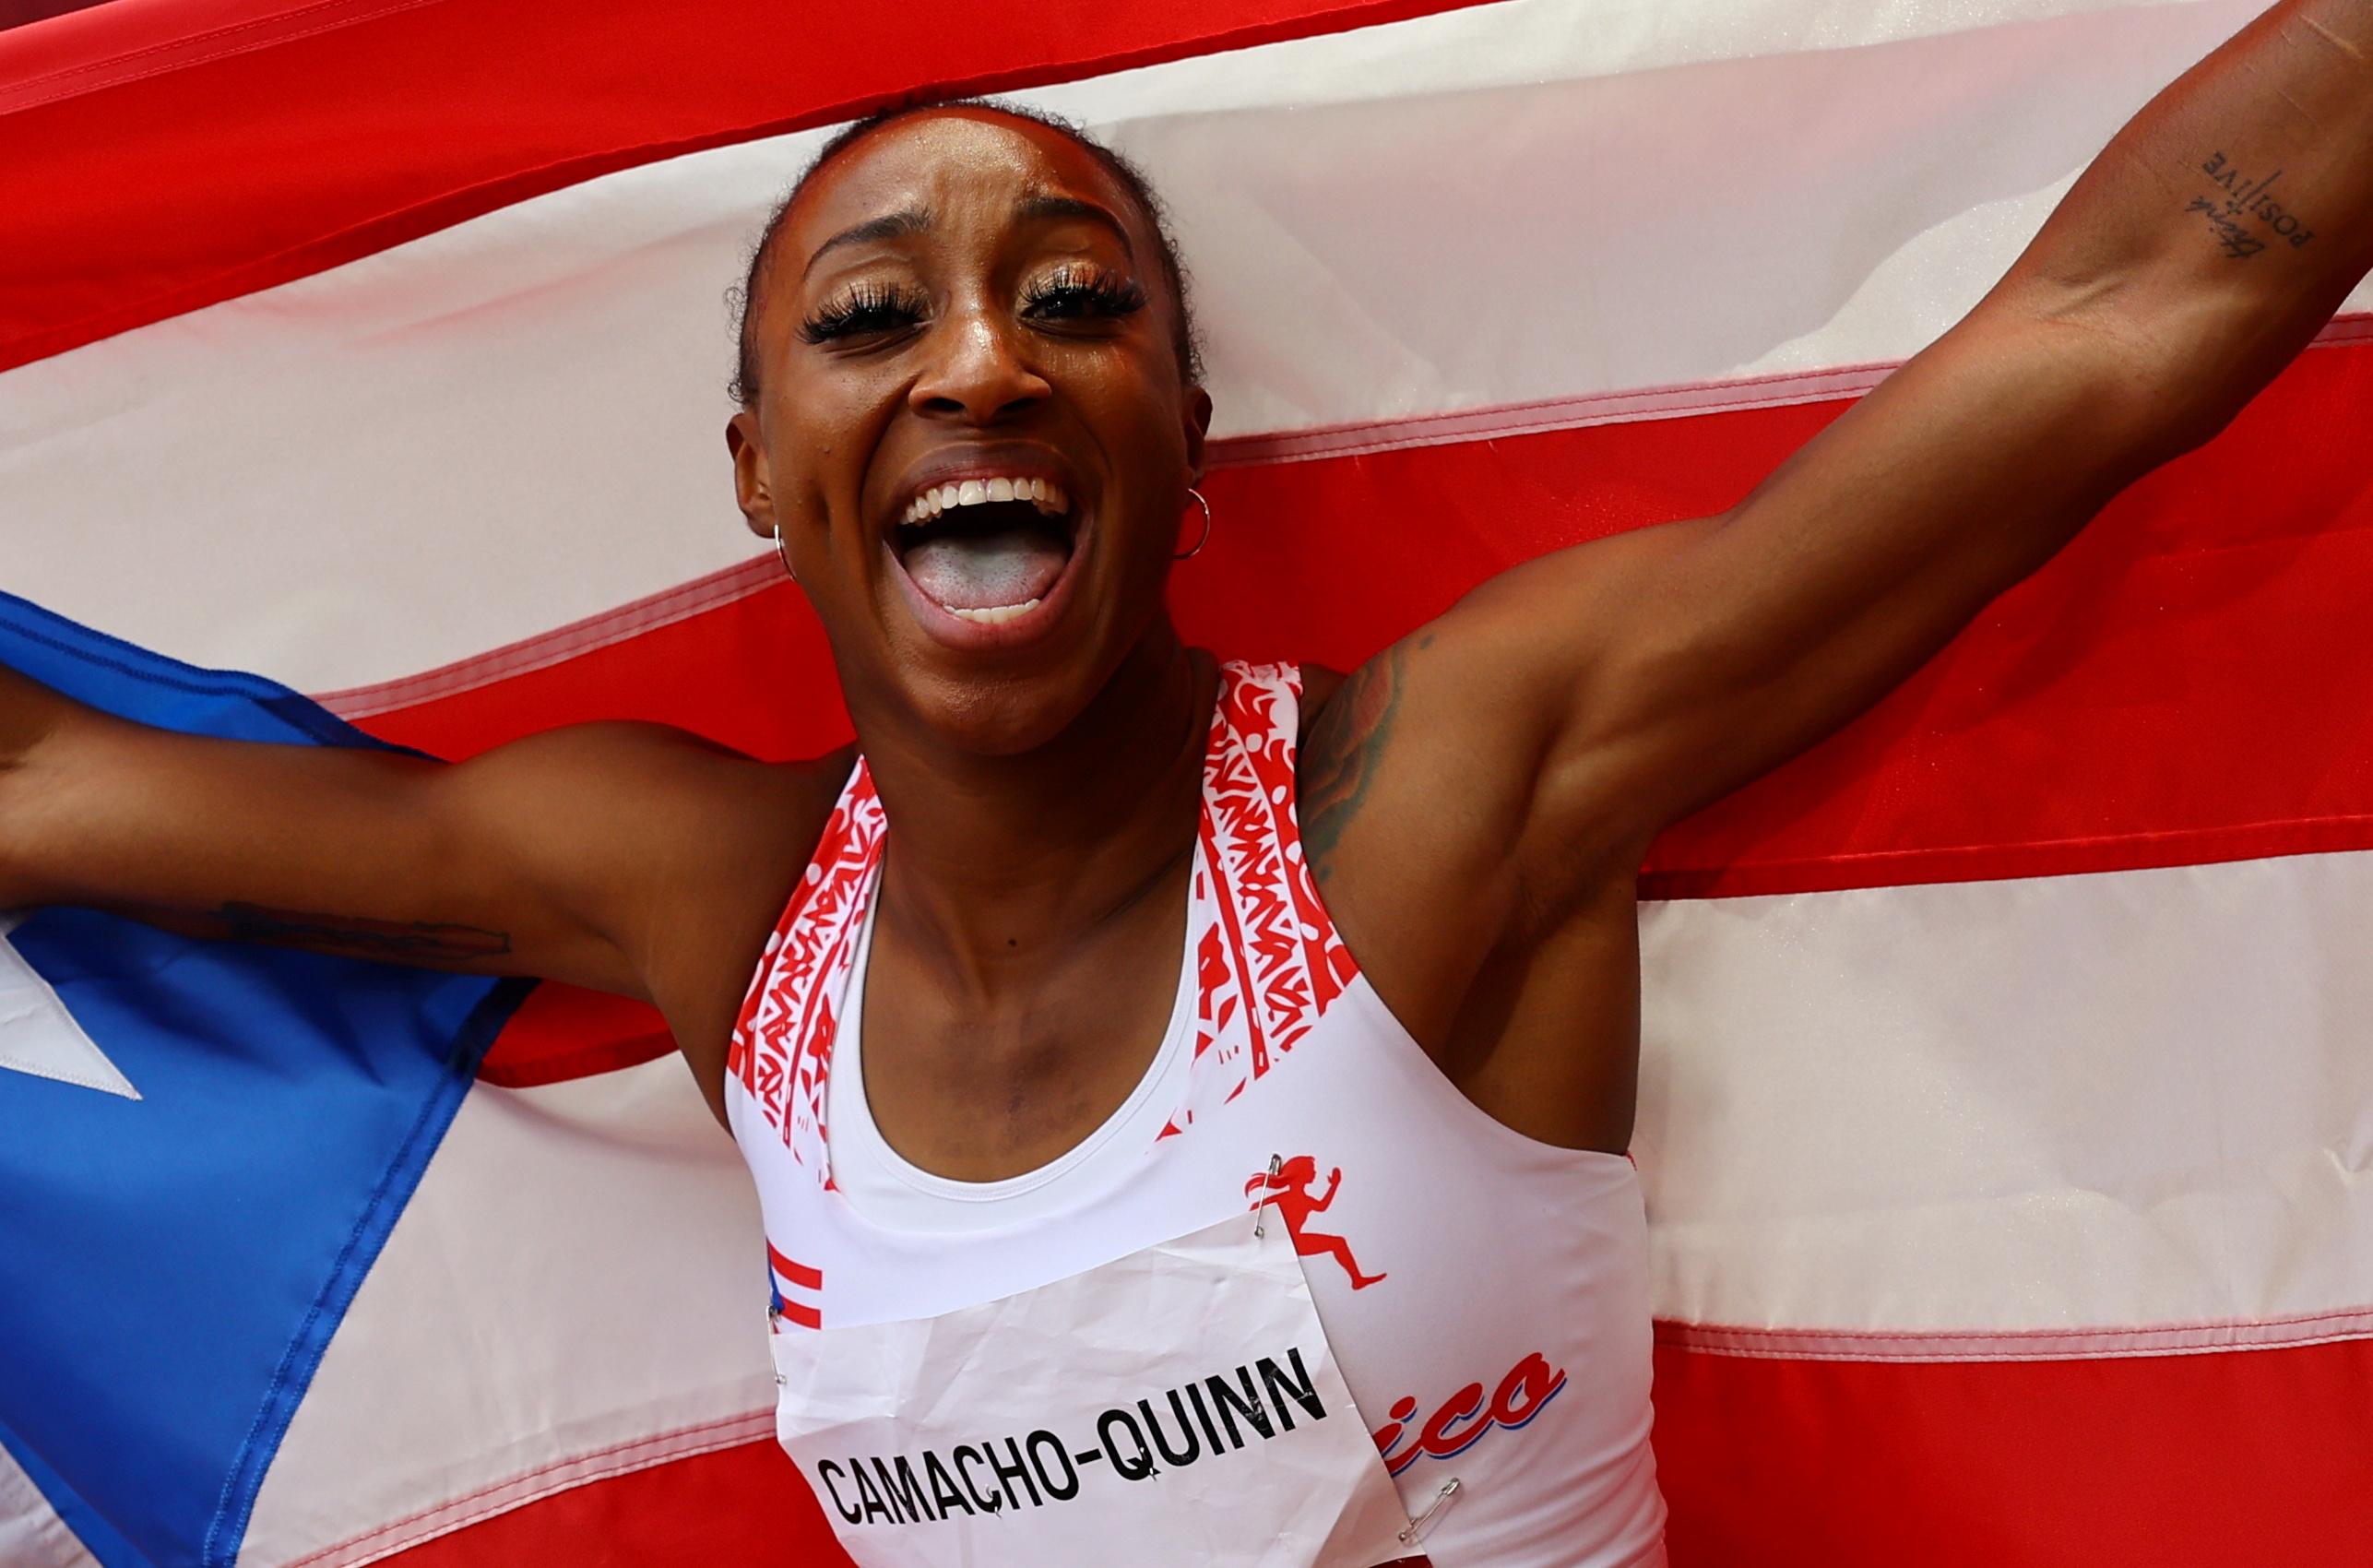 Tokyo 2020 Olympics - Athletics - Women's 100m Hurdles - Final - Olympic Stadium, Tokyo, Japan - August 2, 2021. Jasmine Camacho-Quinn of Puerto Rico celebrates winning gold REUTERS/Kai Pfaffenbach